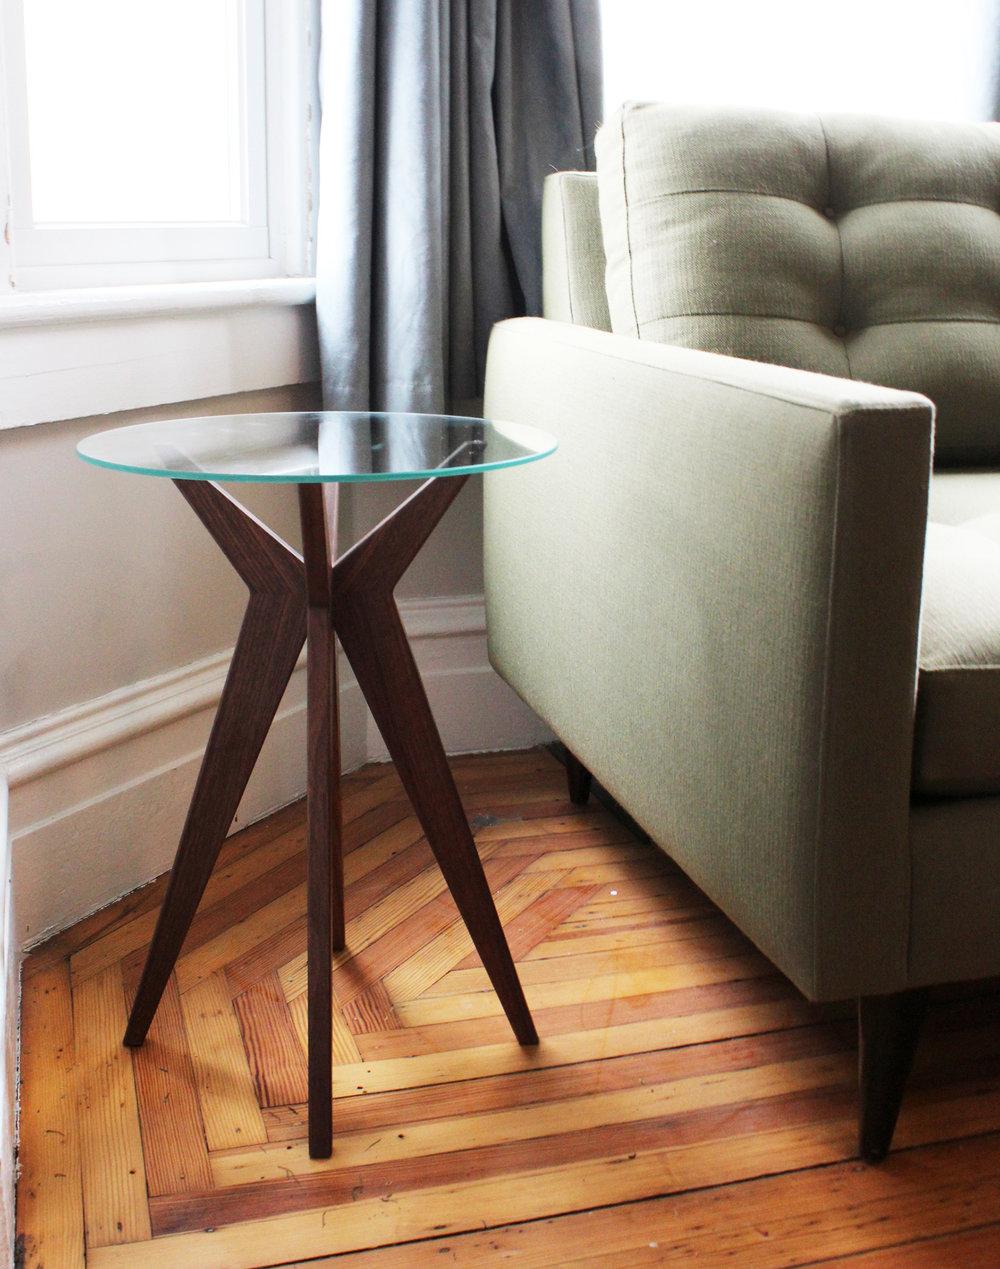 Jax table in walnut and glass